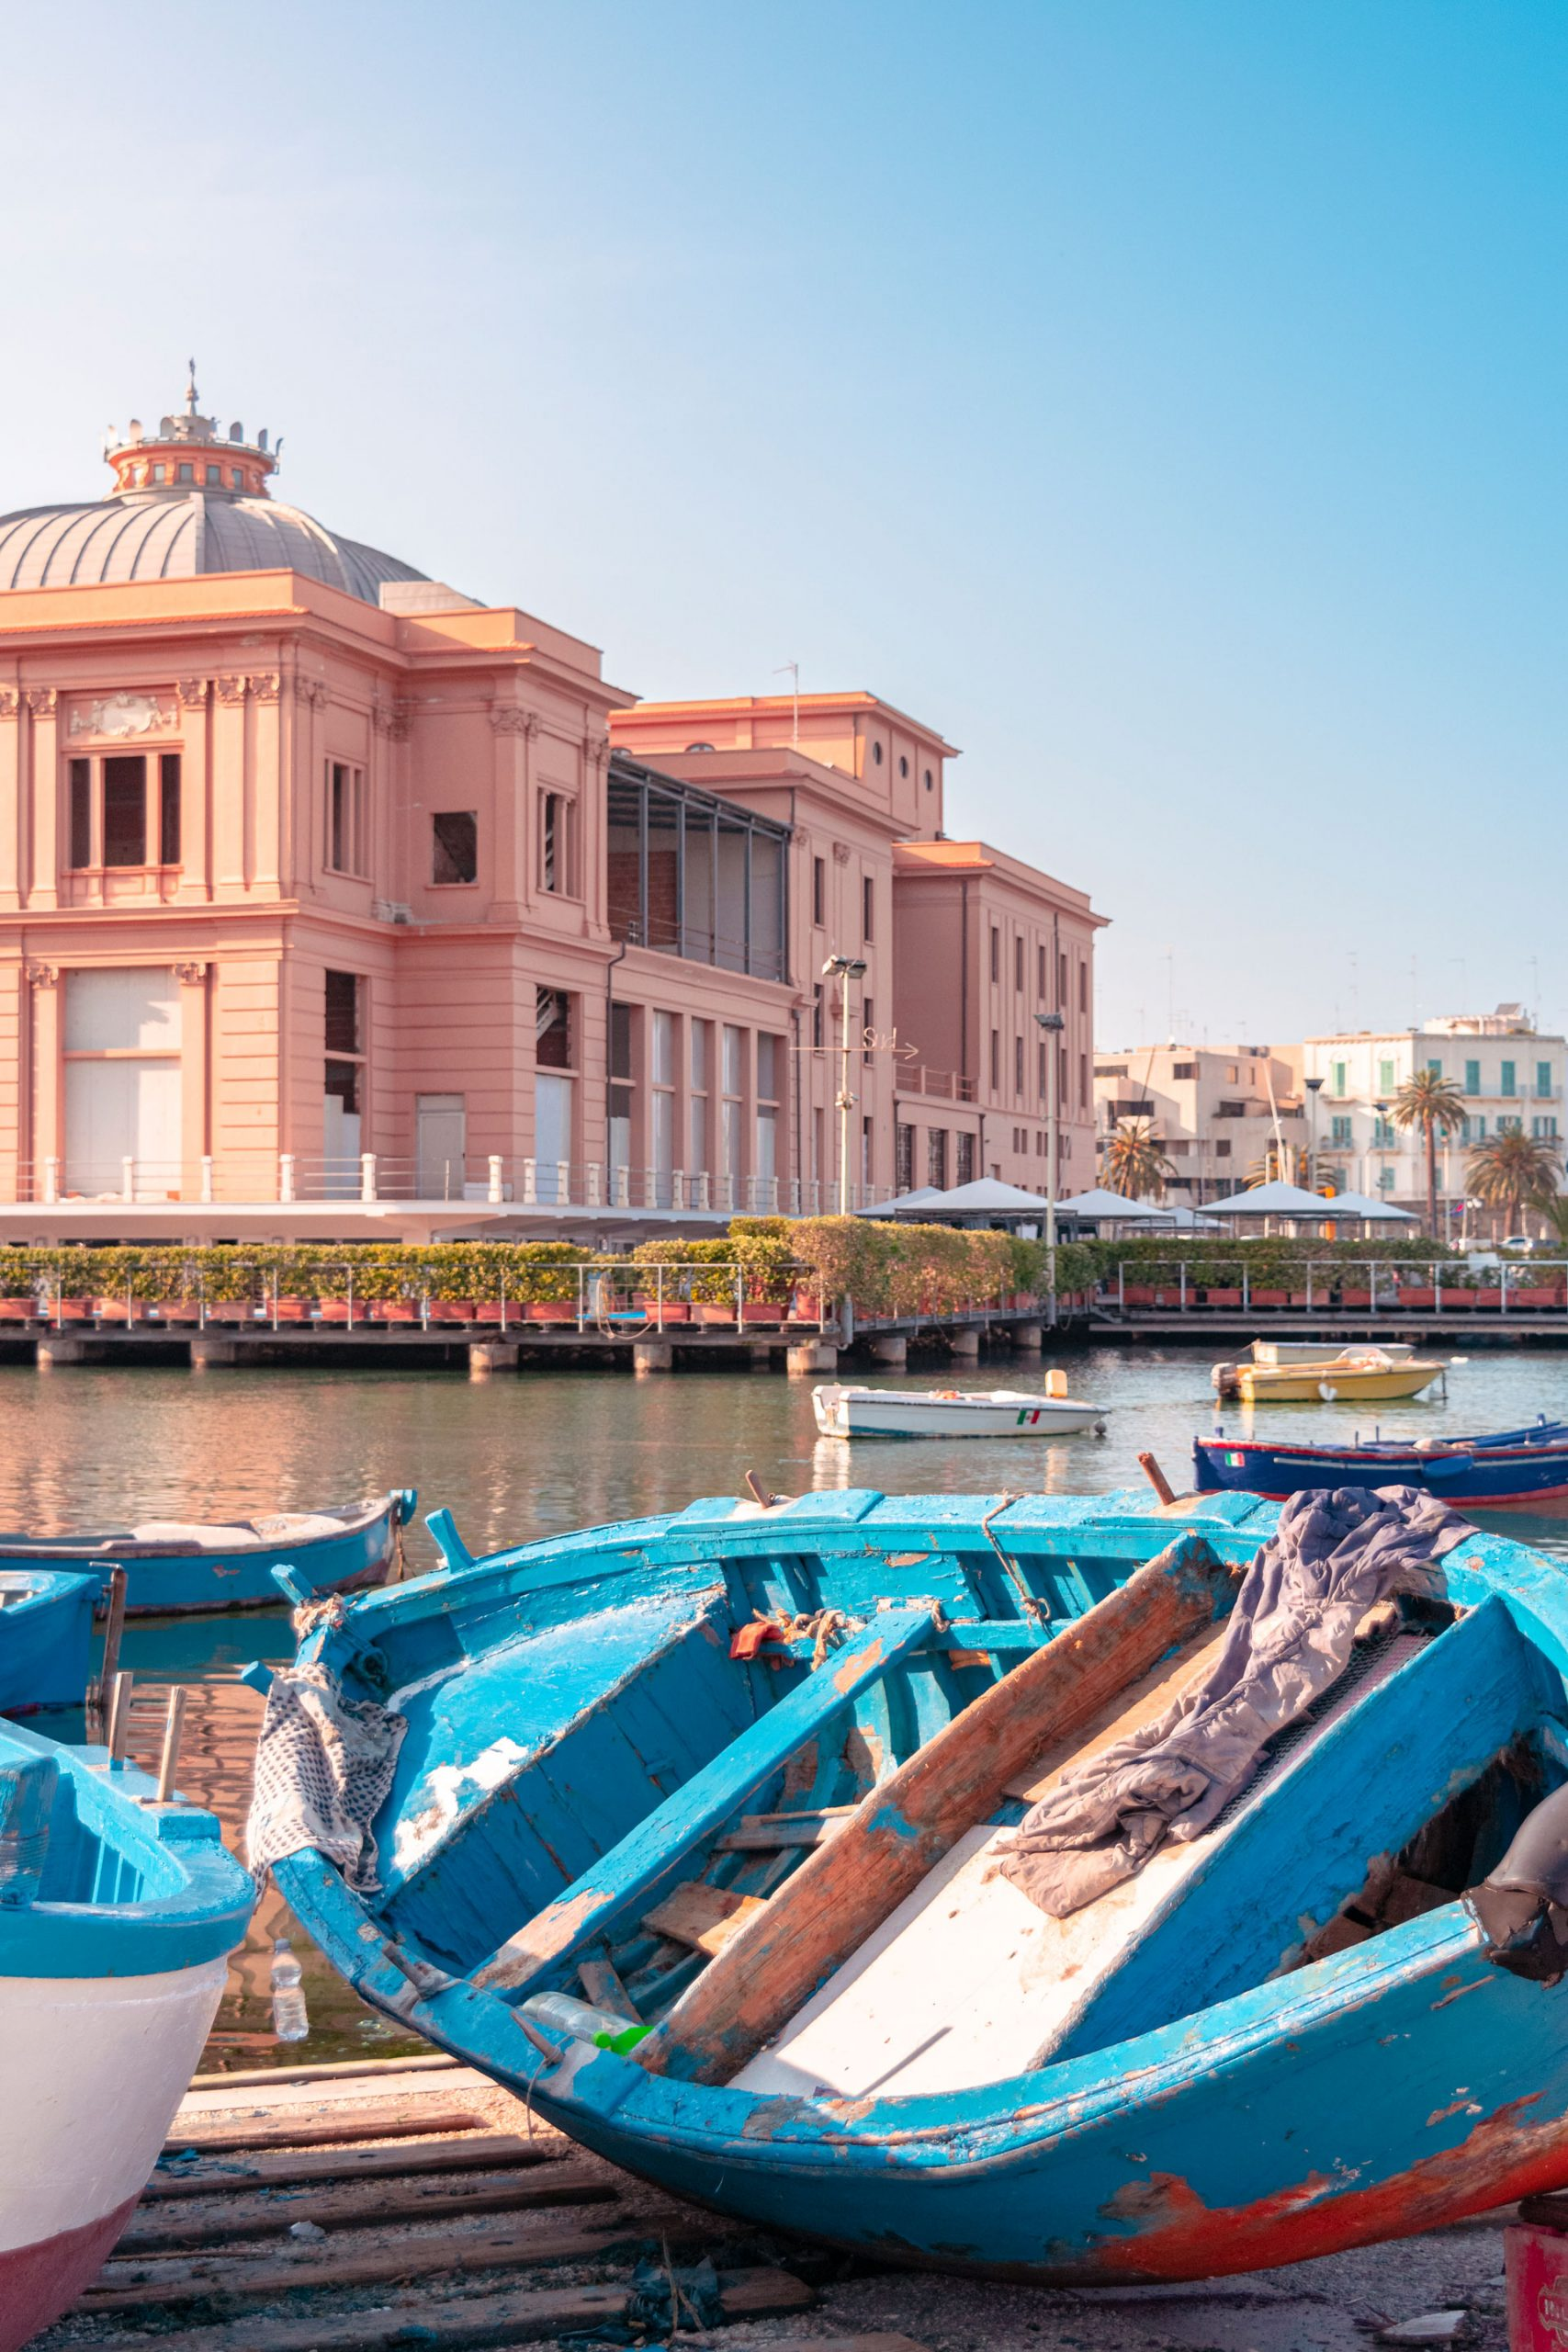 The Margherita Theatre with the local boats | Bari city tour, Puglia, Italy